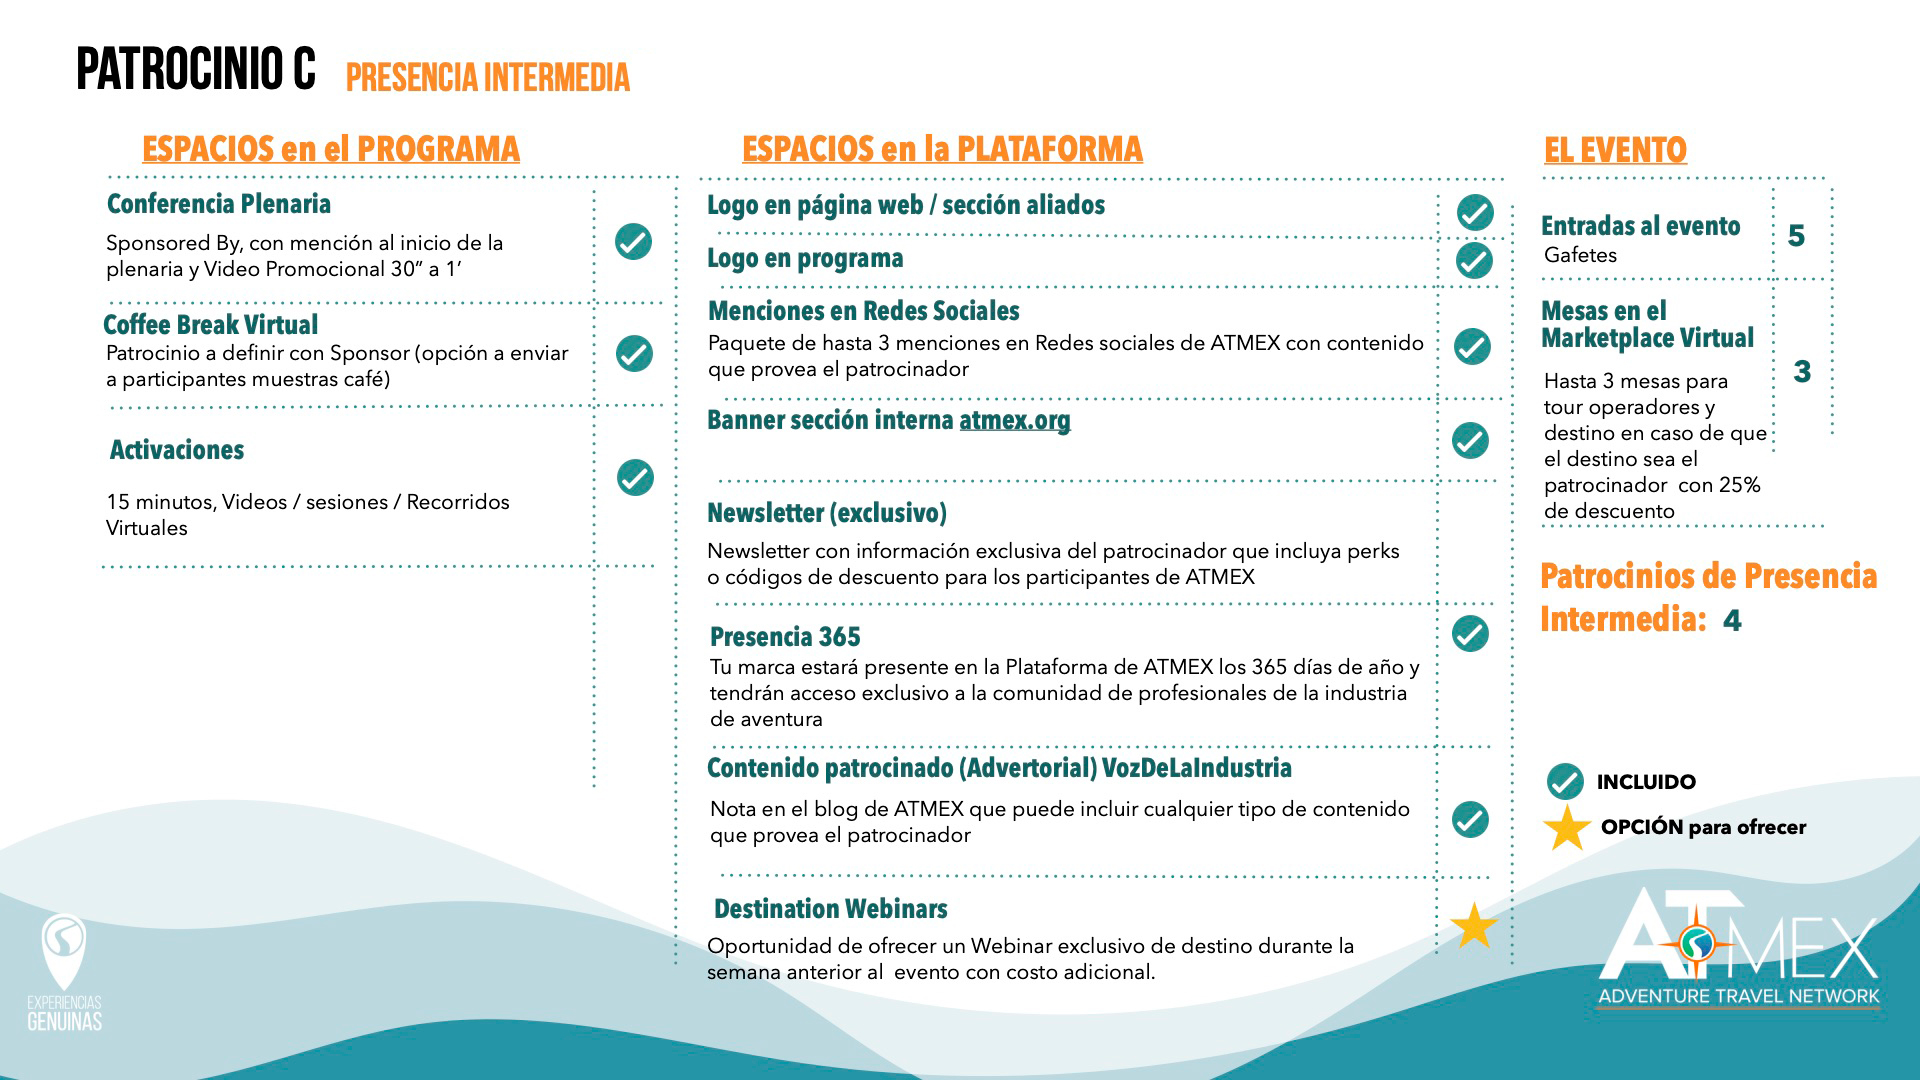 ATMEX-Patrocinio-intermedia